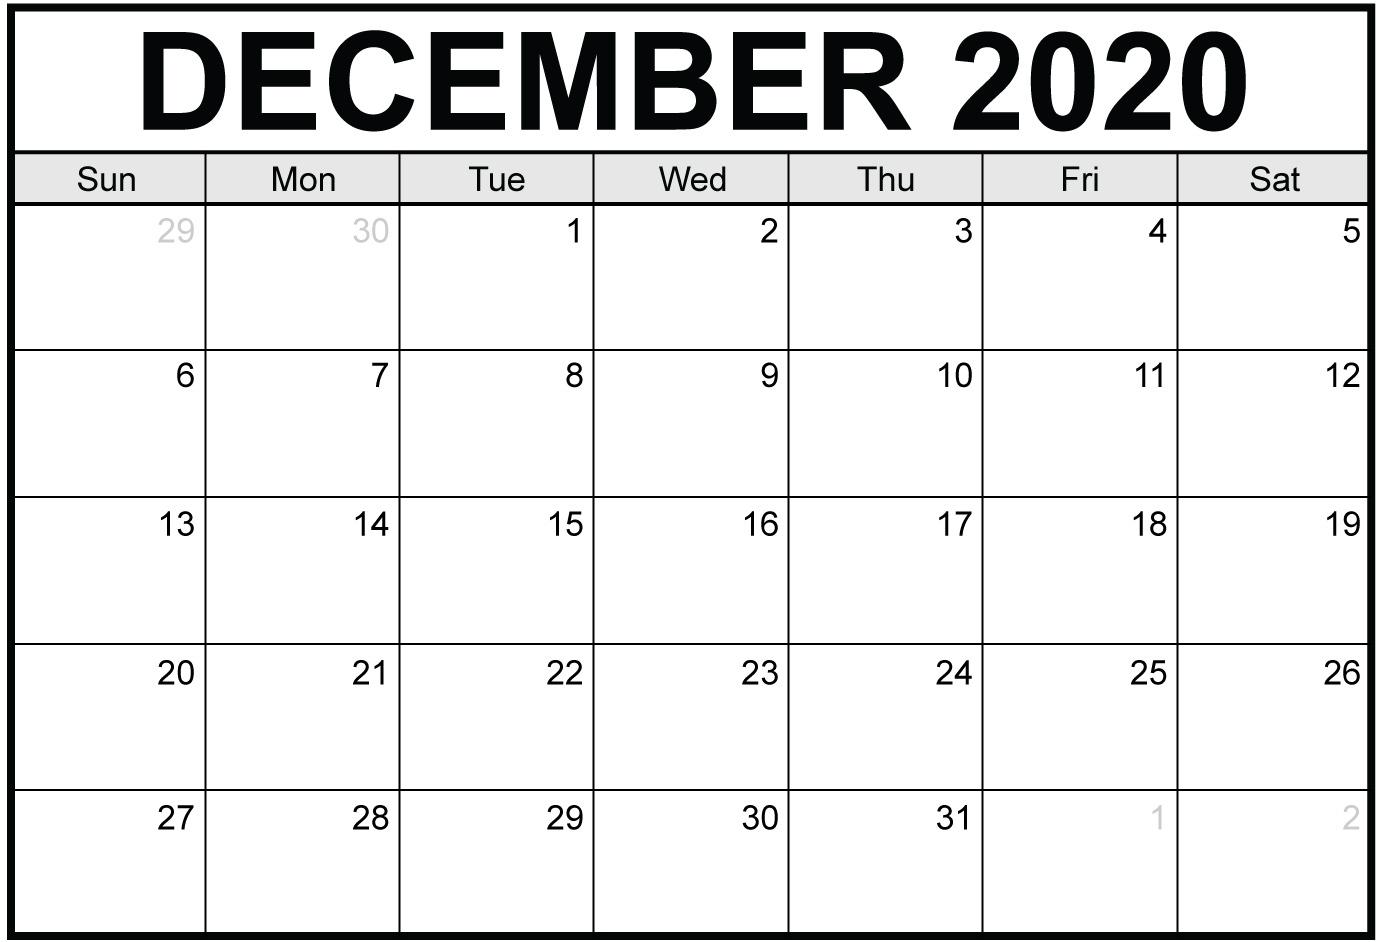 December 2020 Printable Calendar Free With Holidays